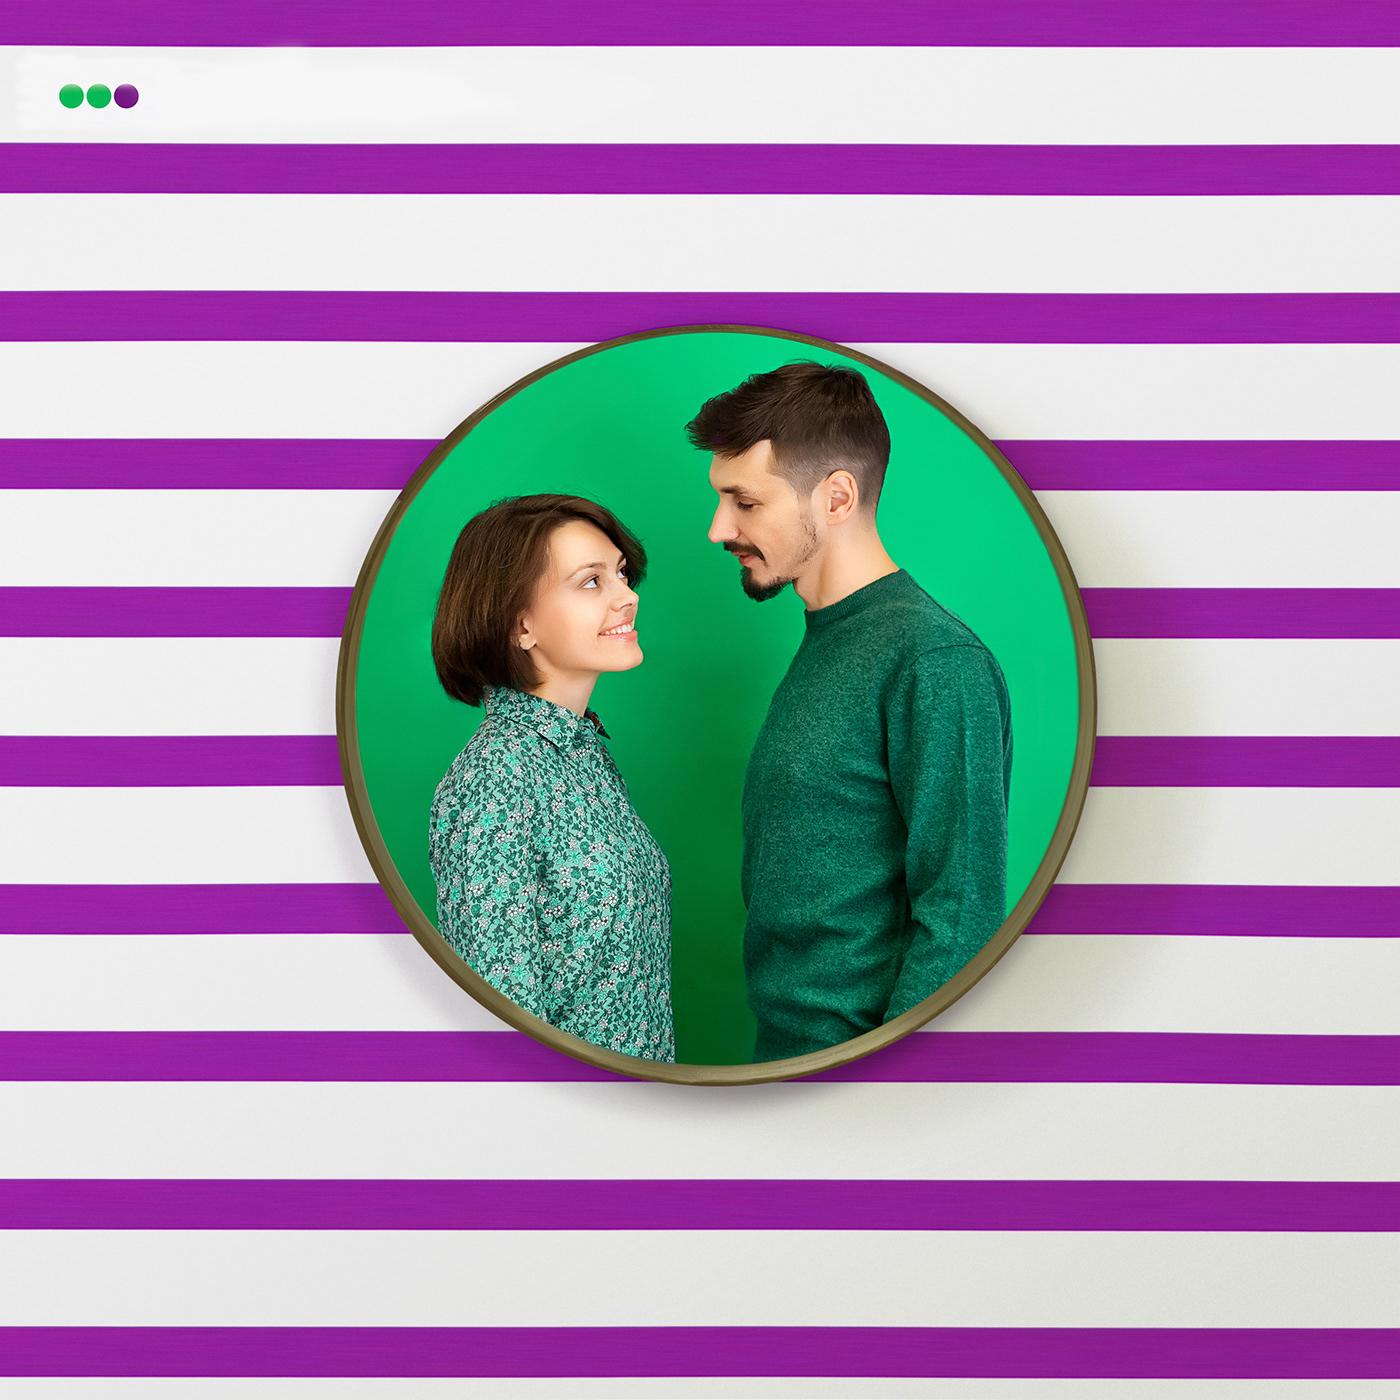 megaton conceptual photography stripes couple Lovers love story